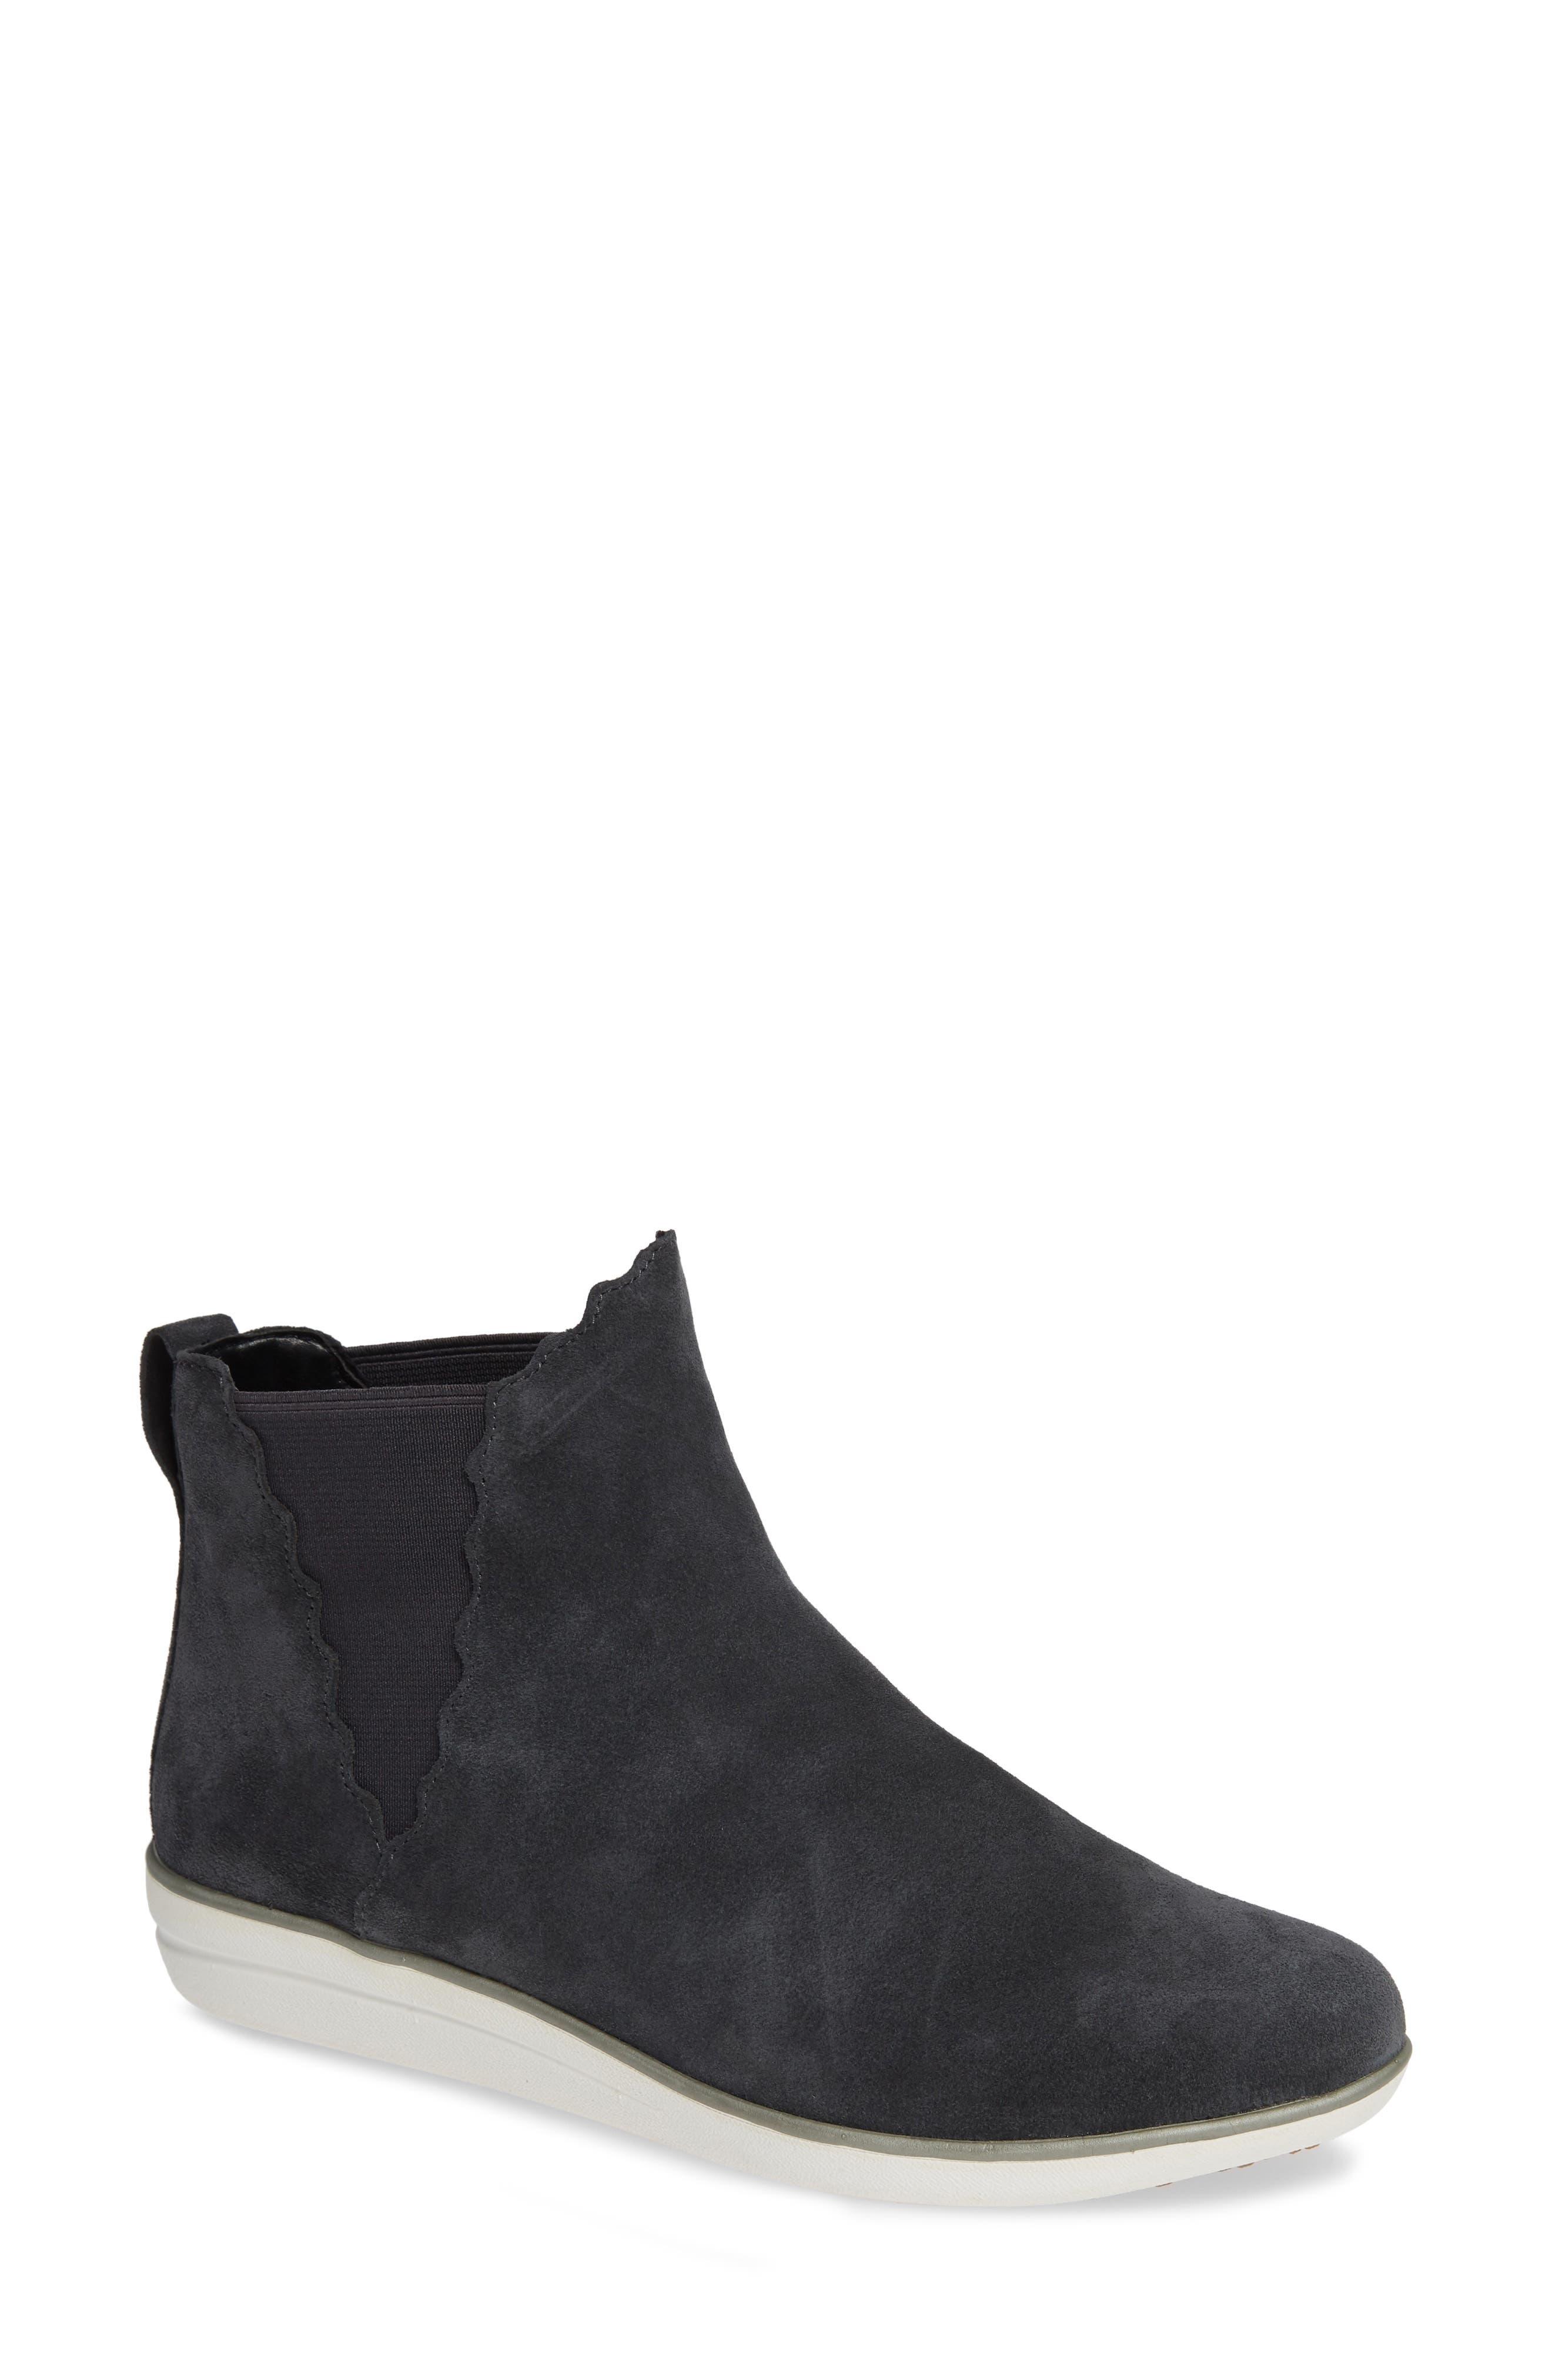 Aetrex Alanna Slip-On High Top Sneaker - Grey